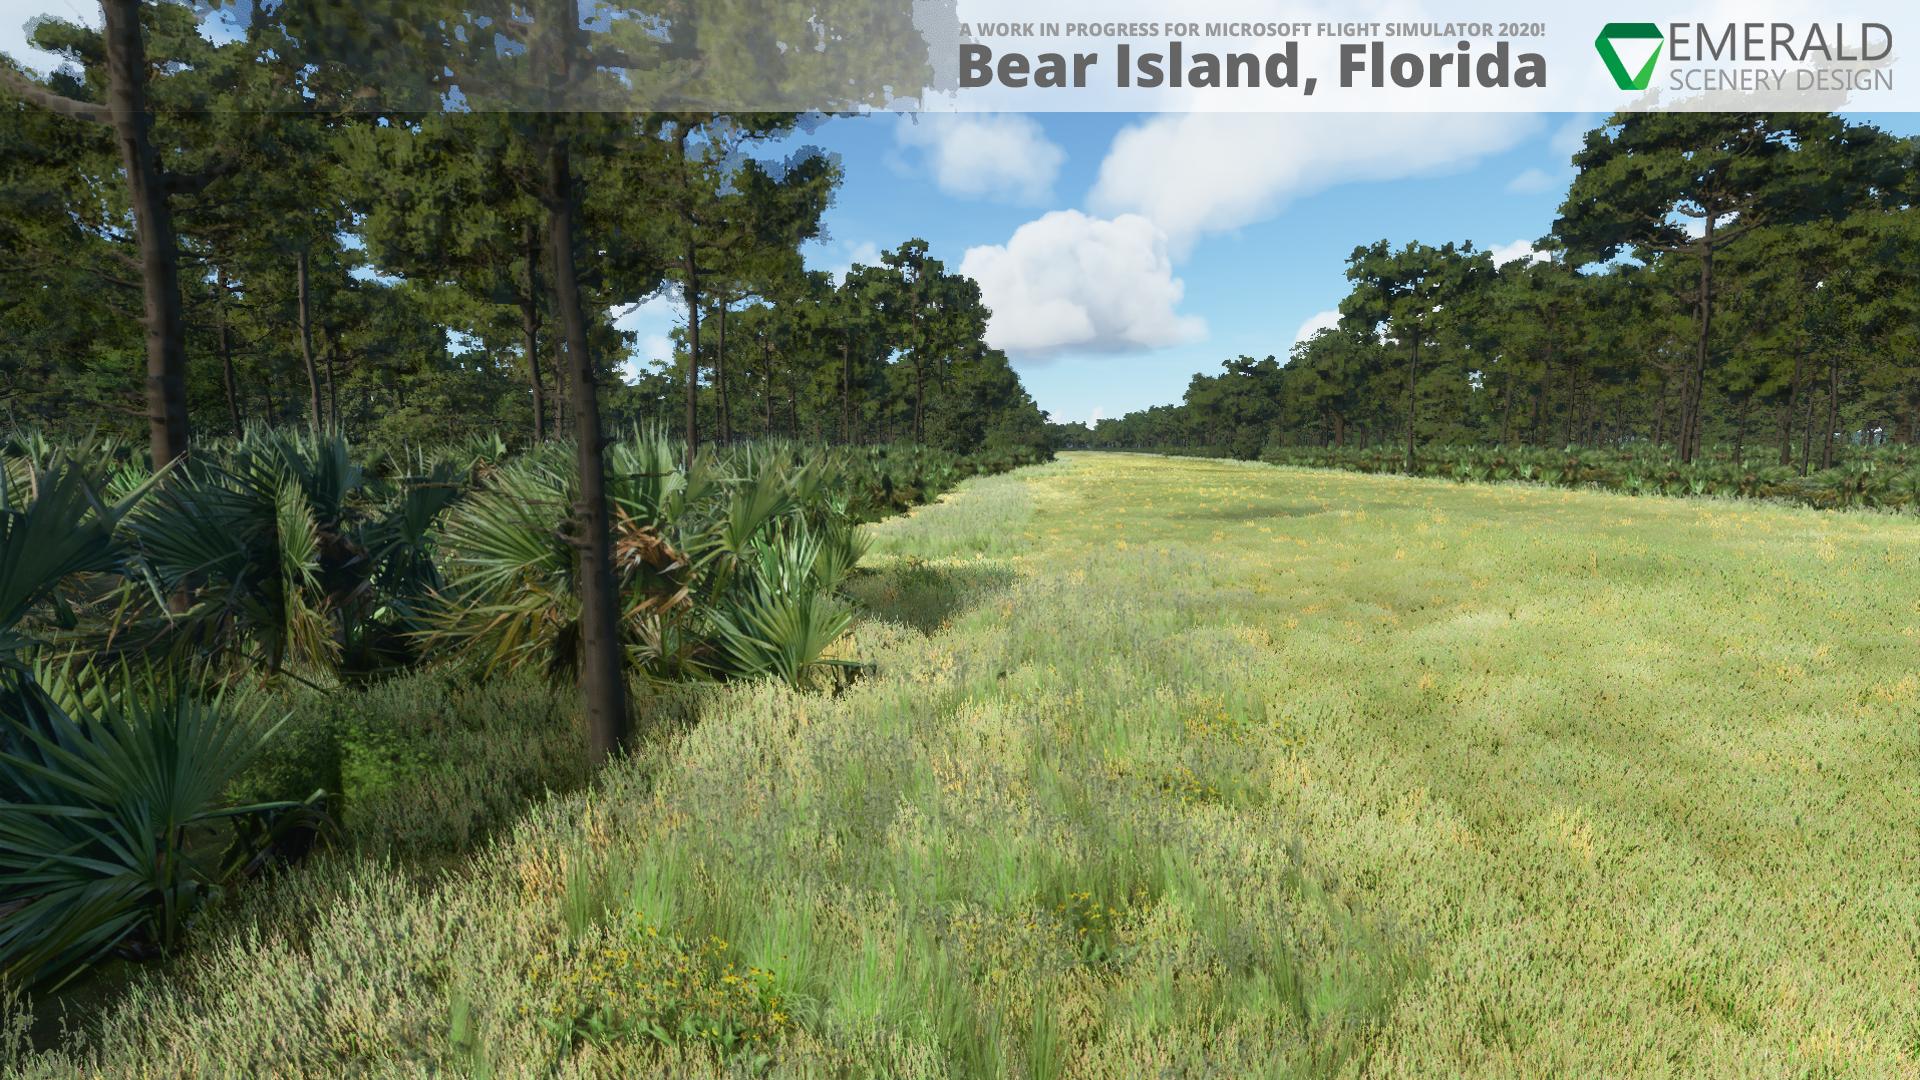 bear_island_florida_msfs_wip_1.jpg